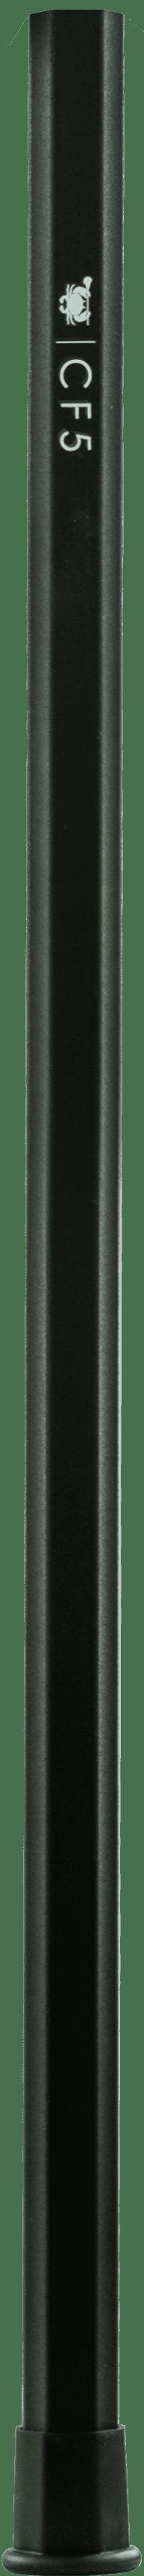 CF5-Black-Cutout-1.png